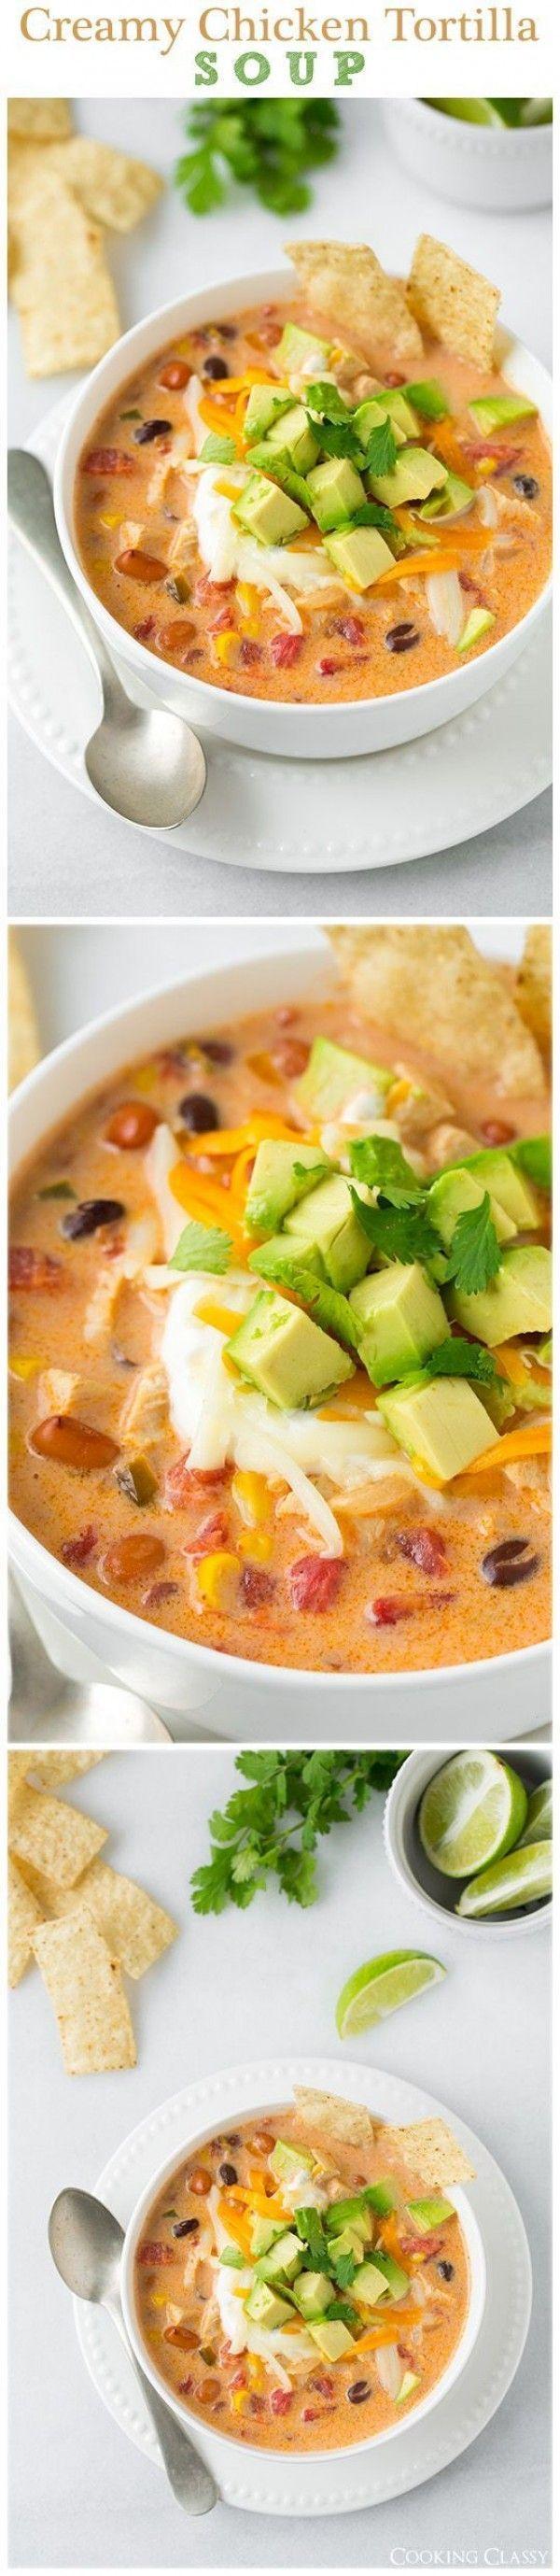 Get the recipe ♥ Creamy Chicken Tortilla Soup /recipes_to_go/